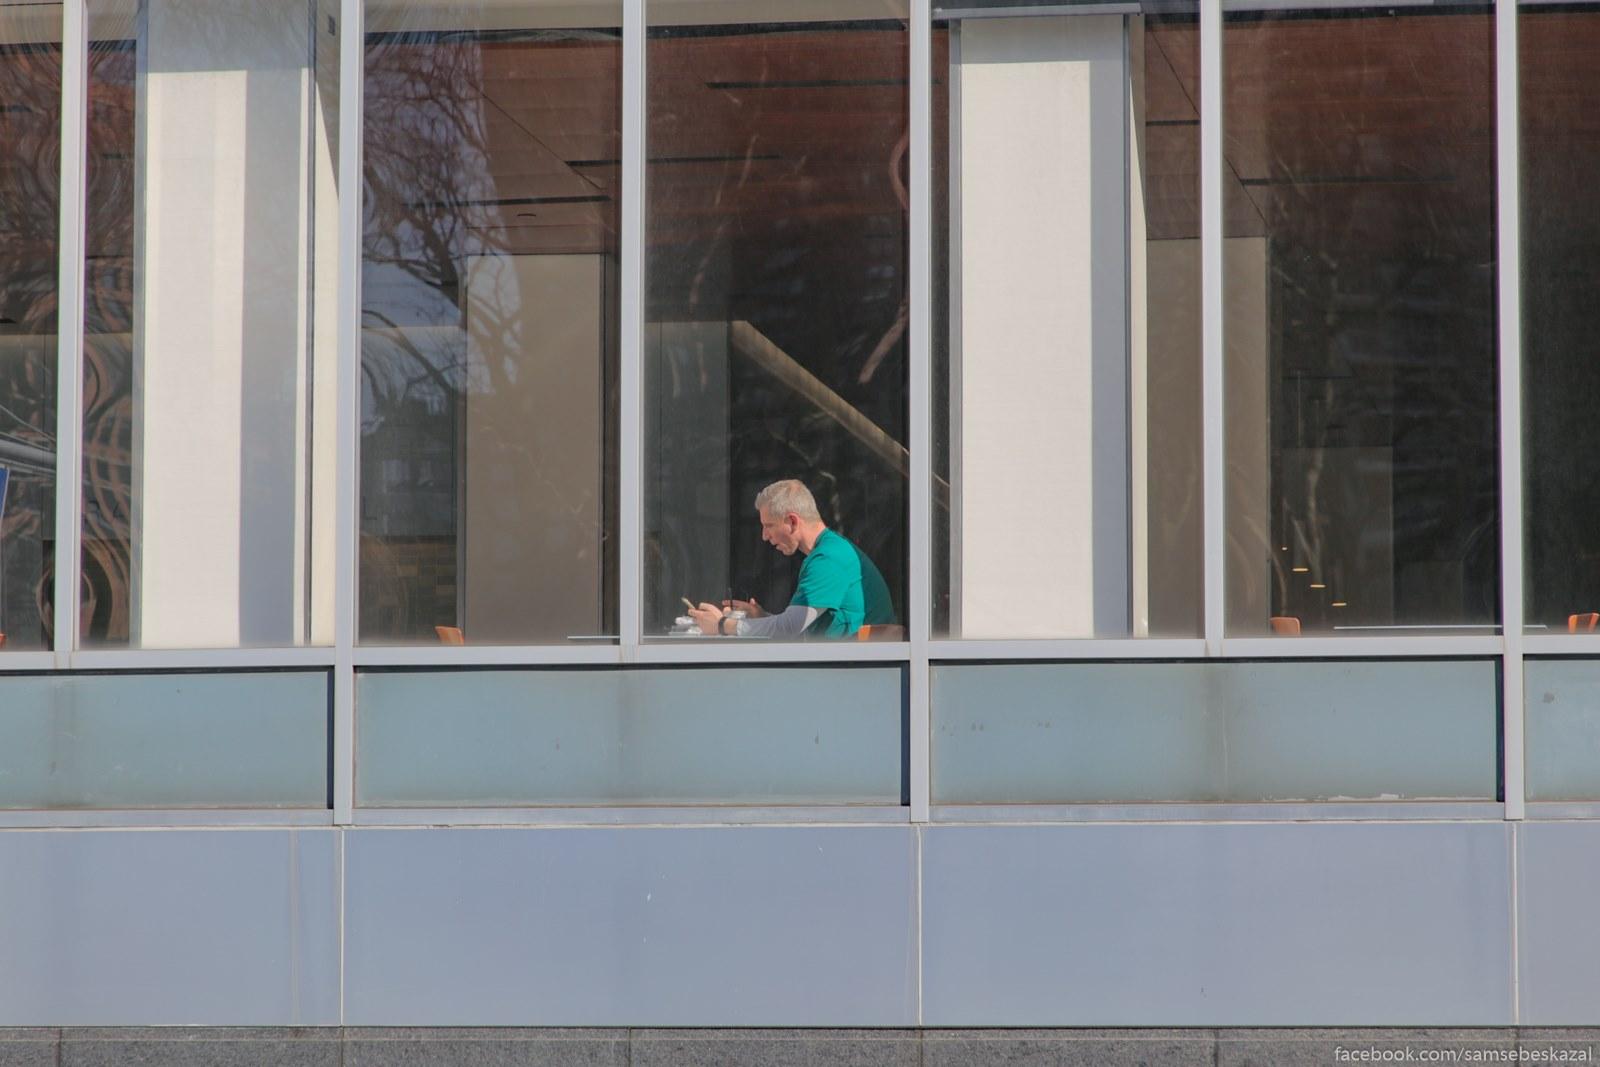 Vrac ili medbrat v okne kafeteria gospitala na Manhettene.